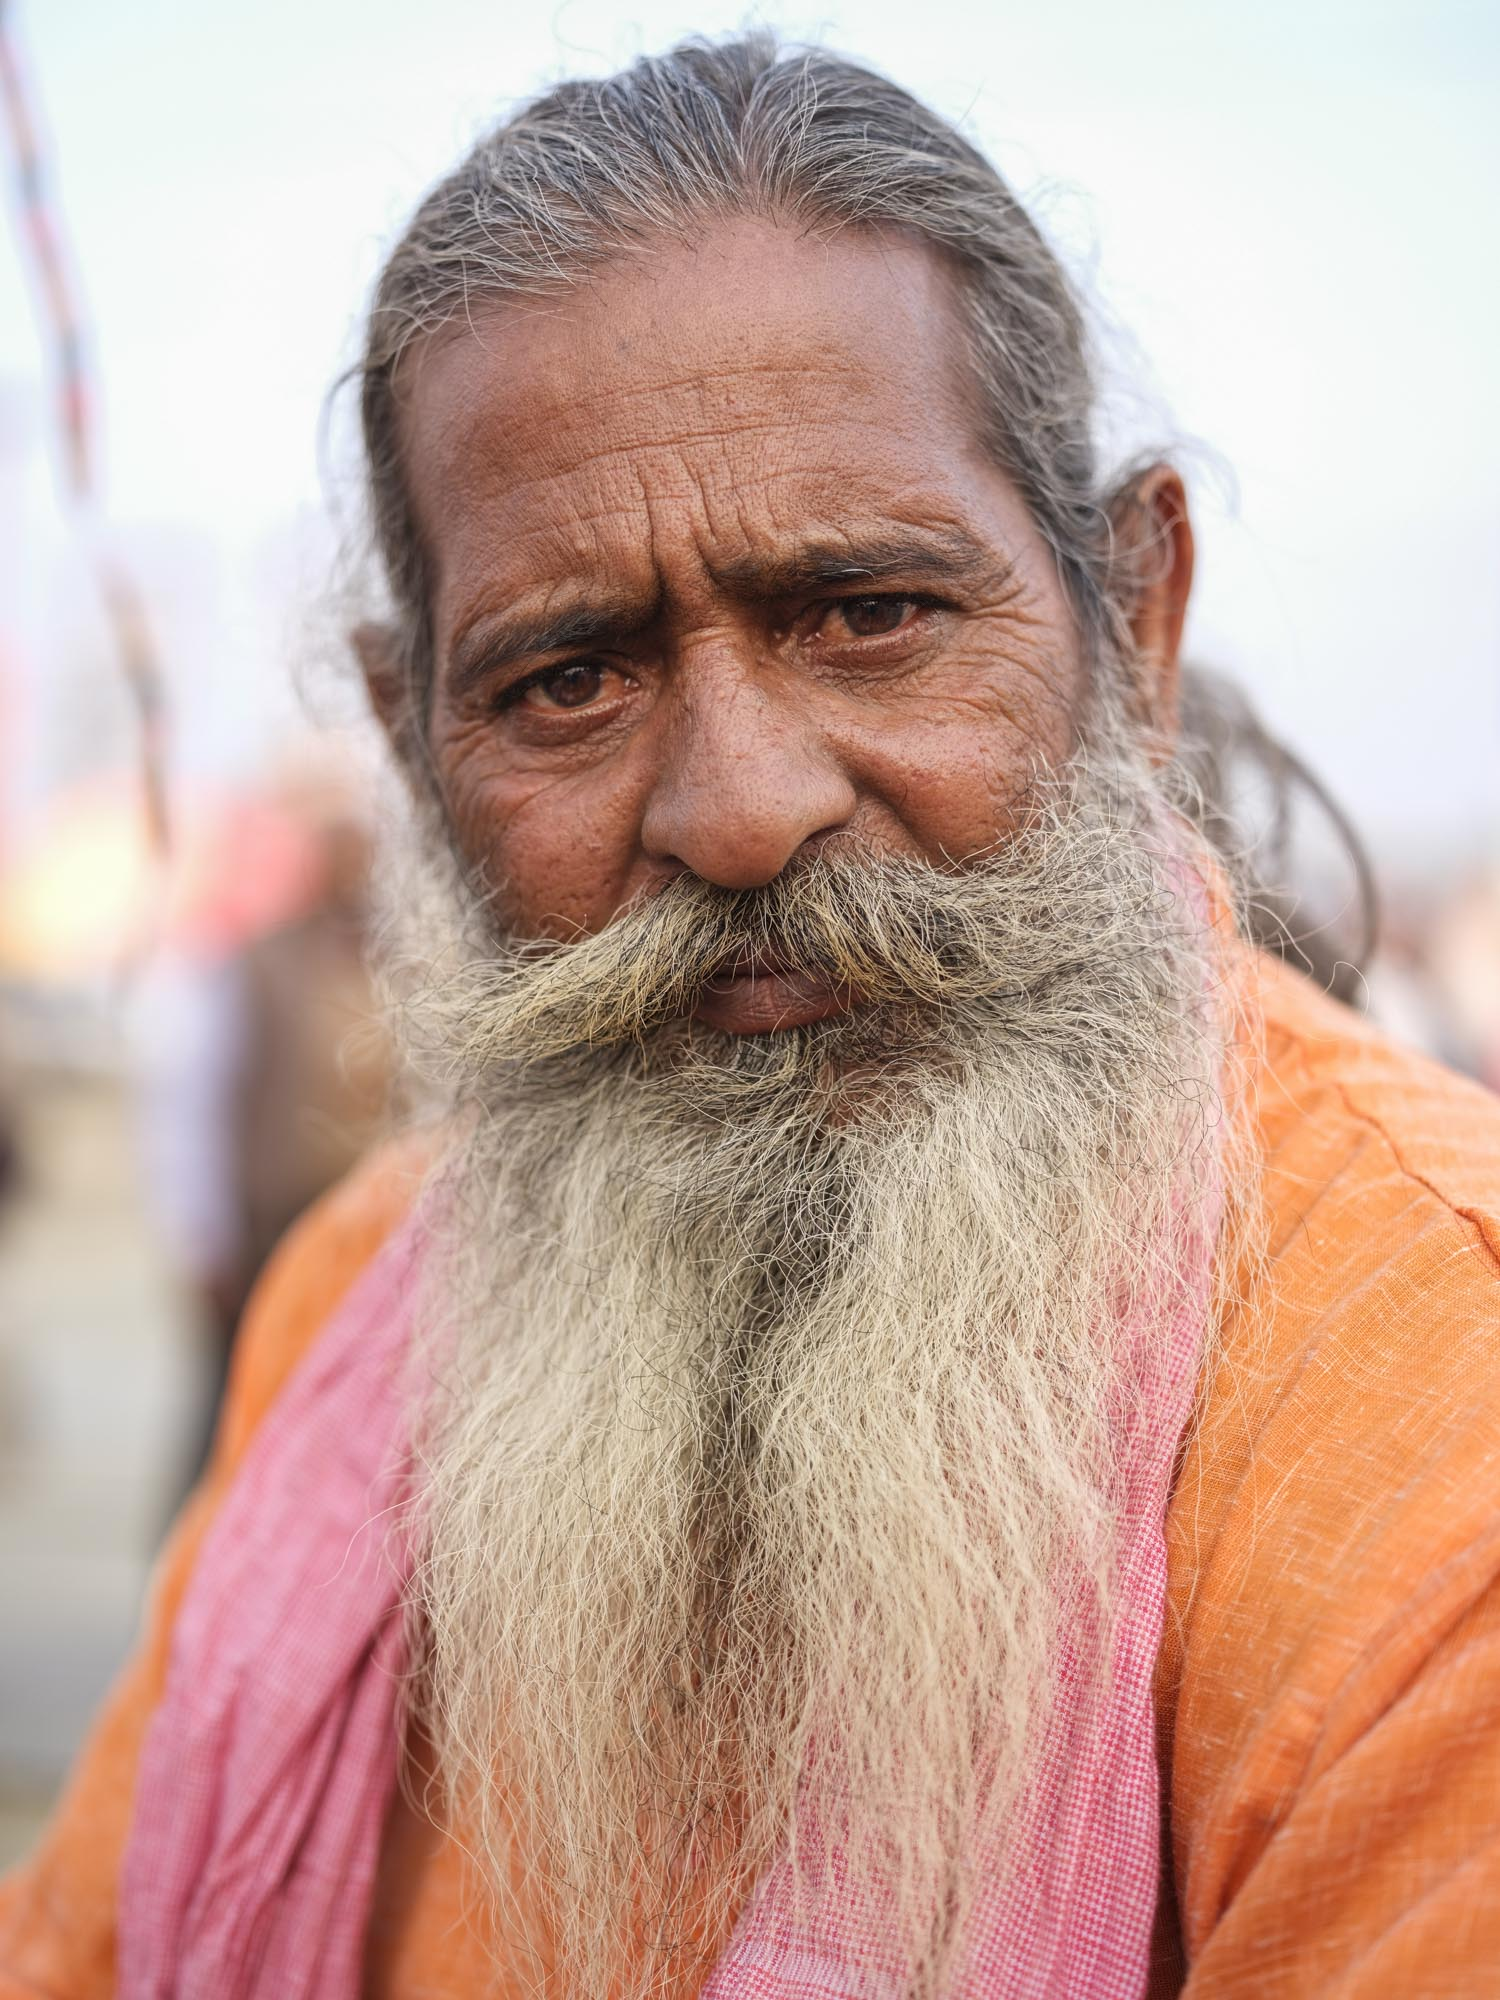 man market pilgrims Kumbh mela 2019 India Allahabad Prayagraj Ardh hindu religious Festival event rivers photographer jose jeuland photography